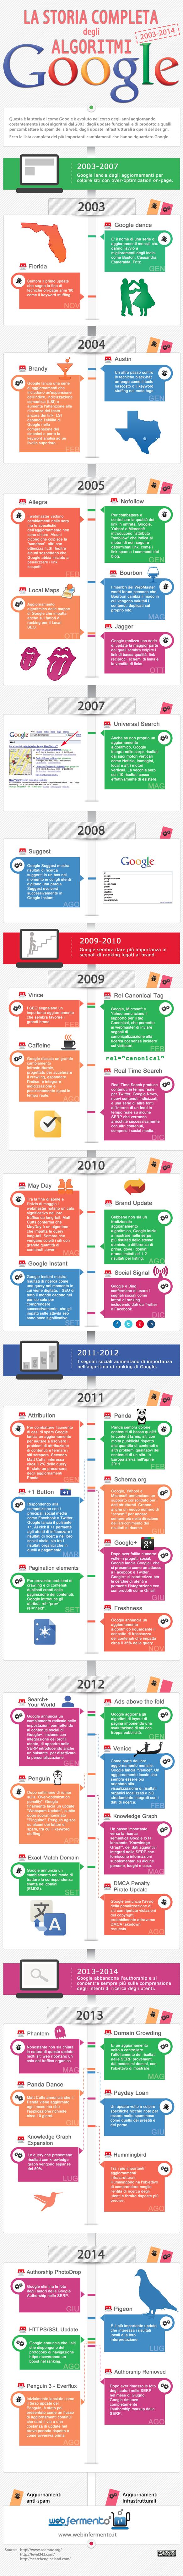 infografica_google_storia_ITA